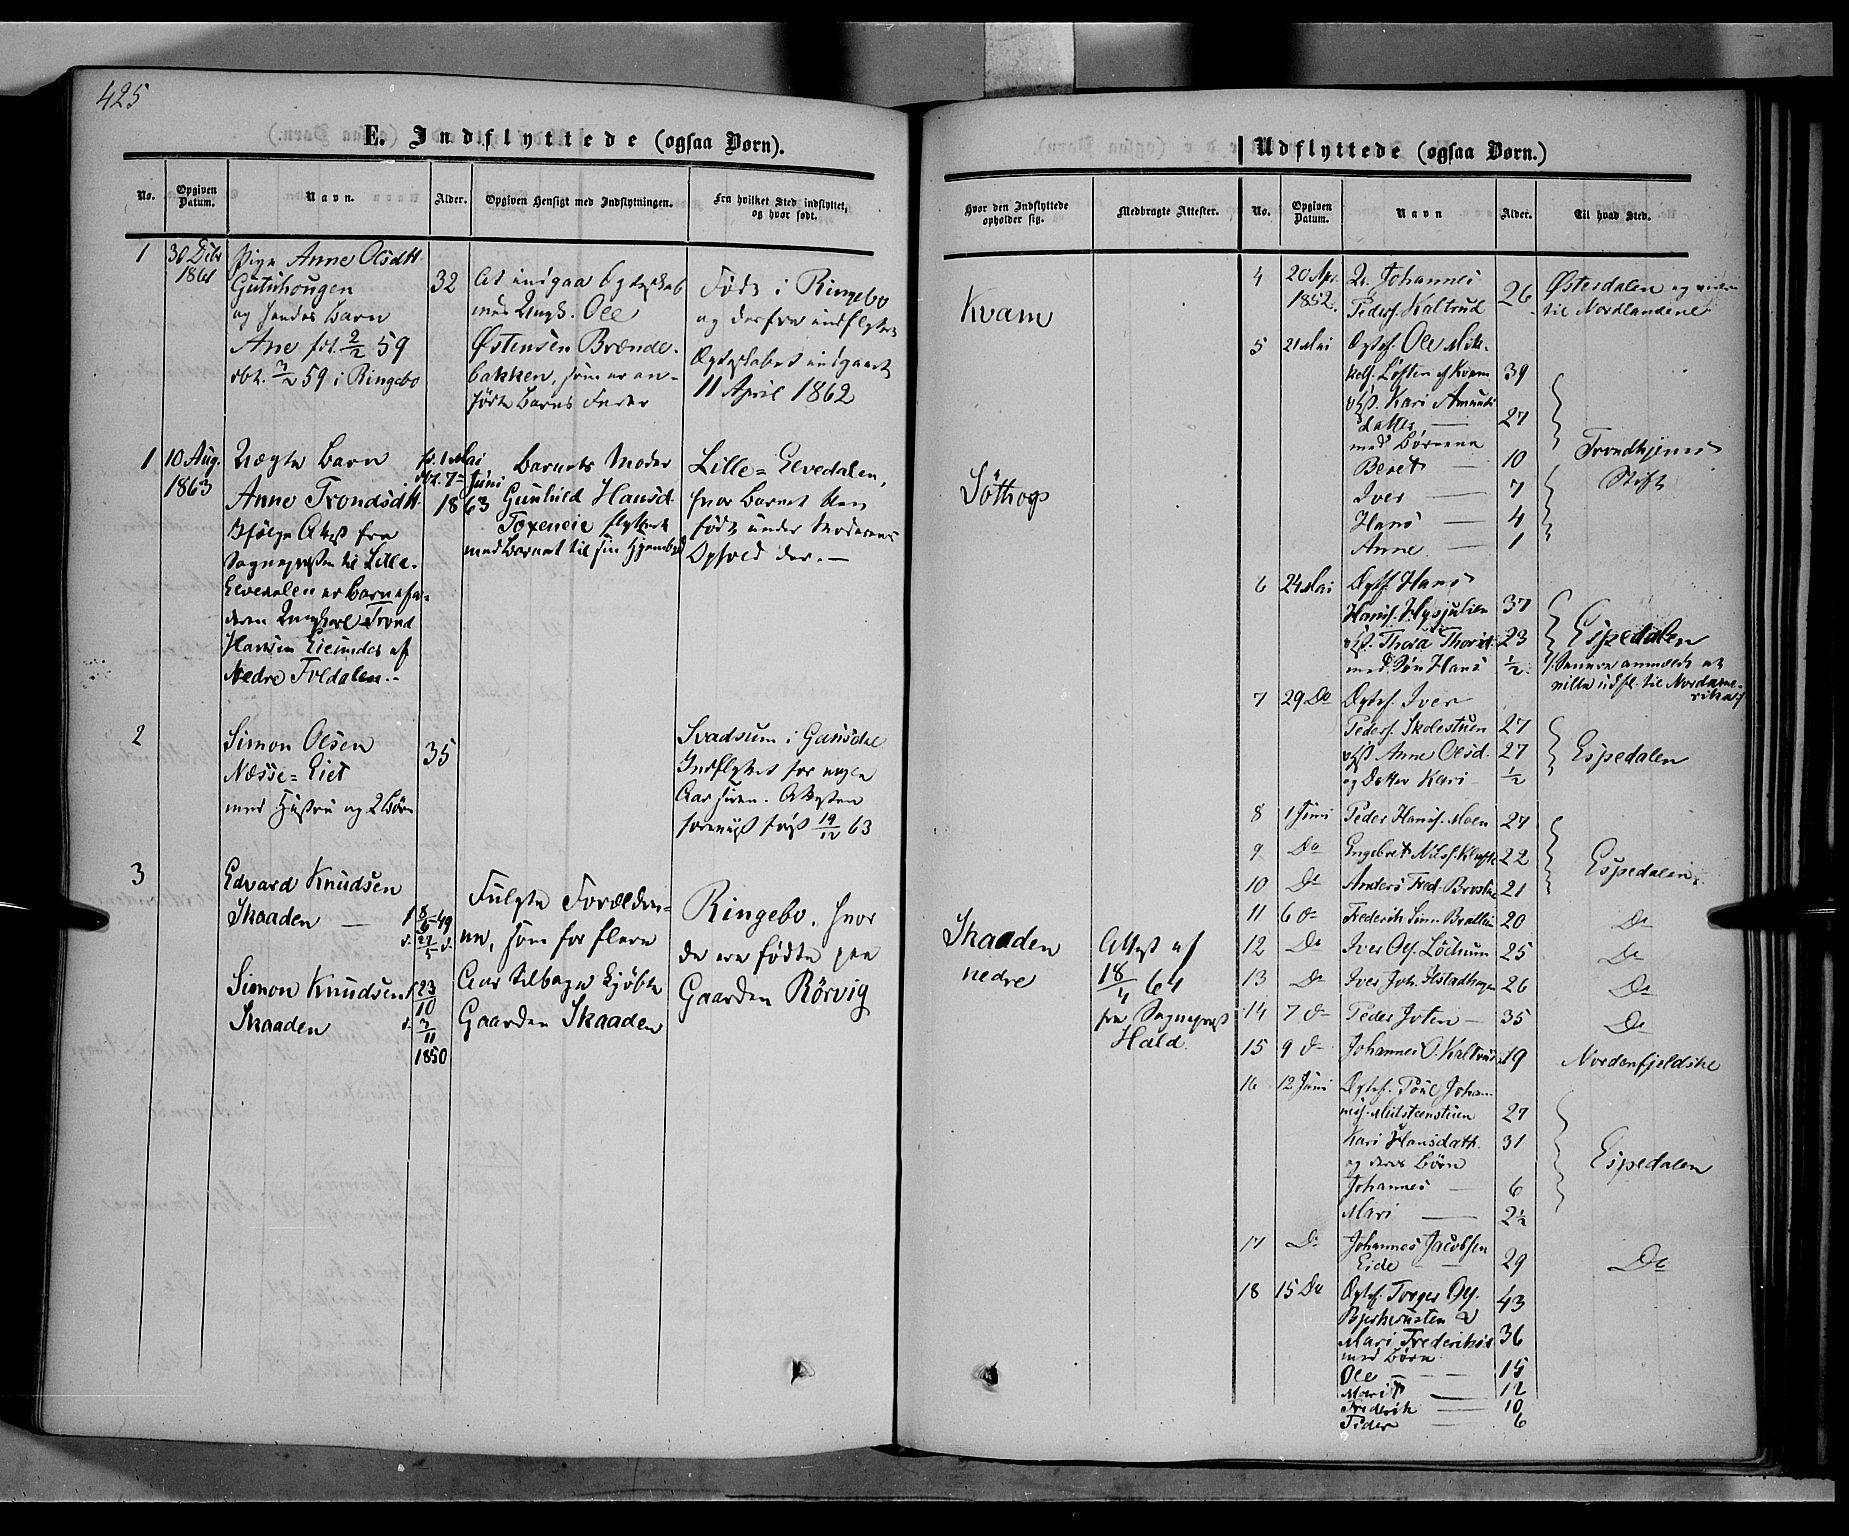 SAH, Nord-Fron prestekontor, Ministerialbok nr. 1, 1851-1864, s. 425